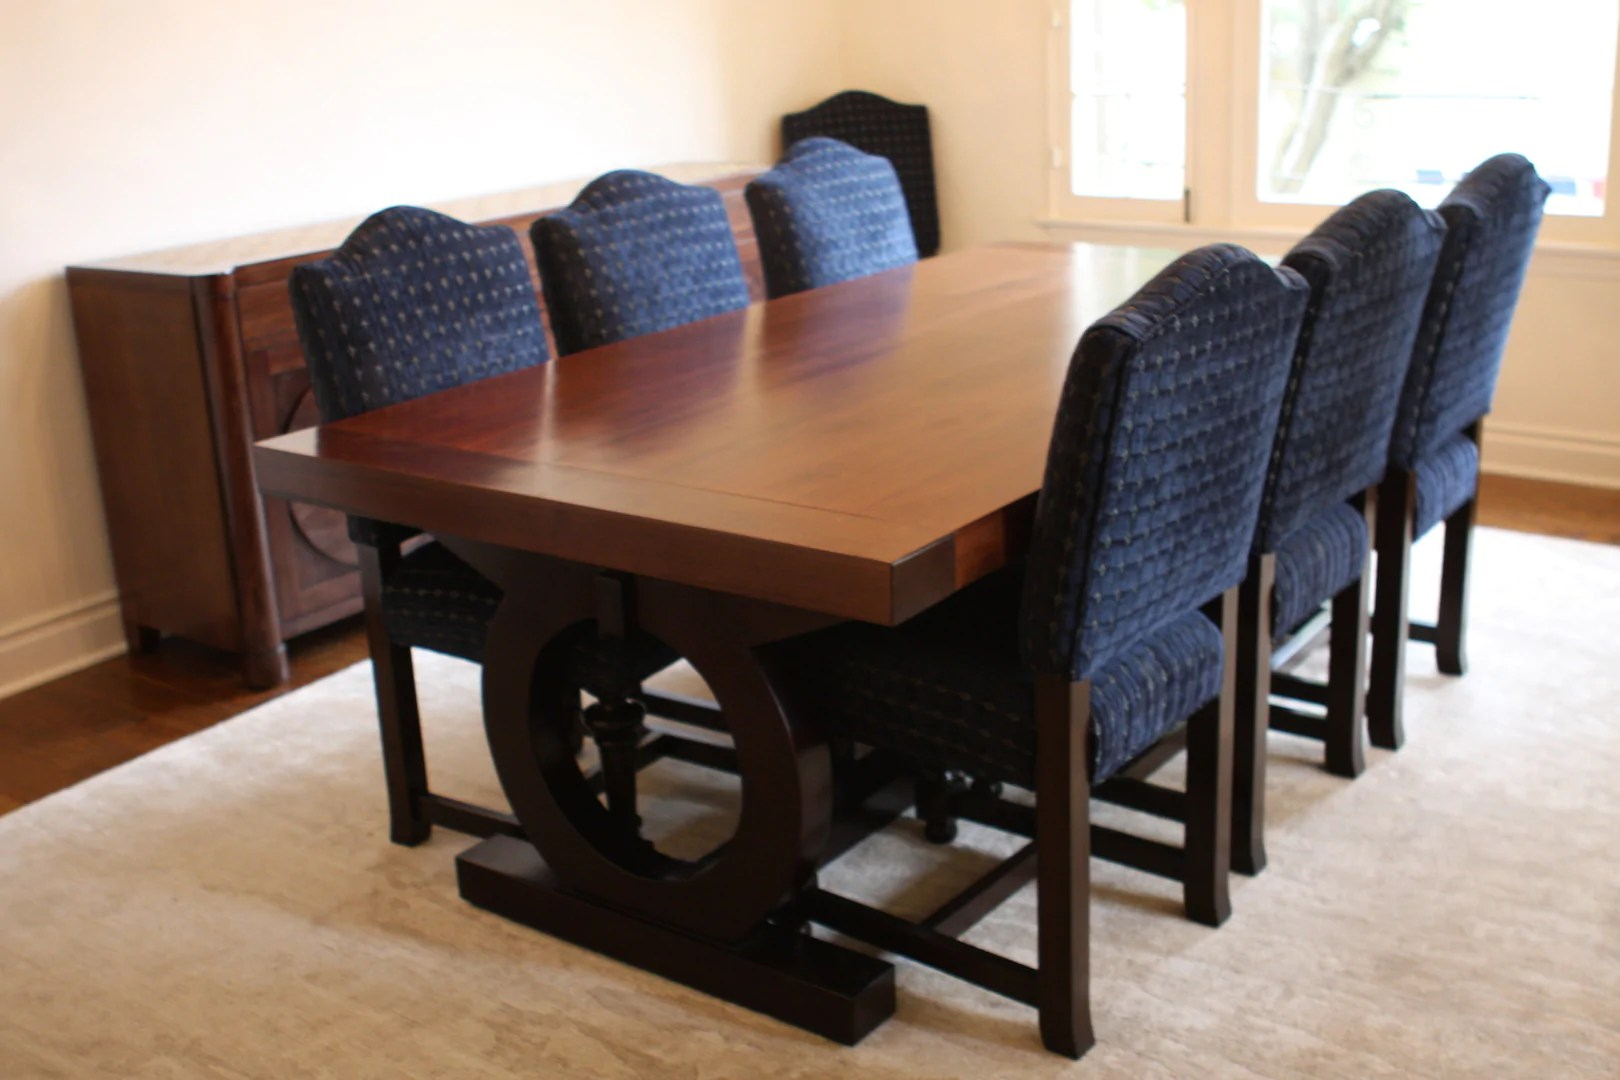 custom restaurant tables and chairs papasan chair cushion world market dining room vignettes  mortise tenon